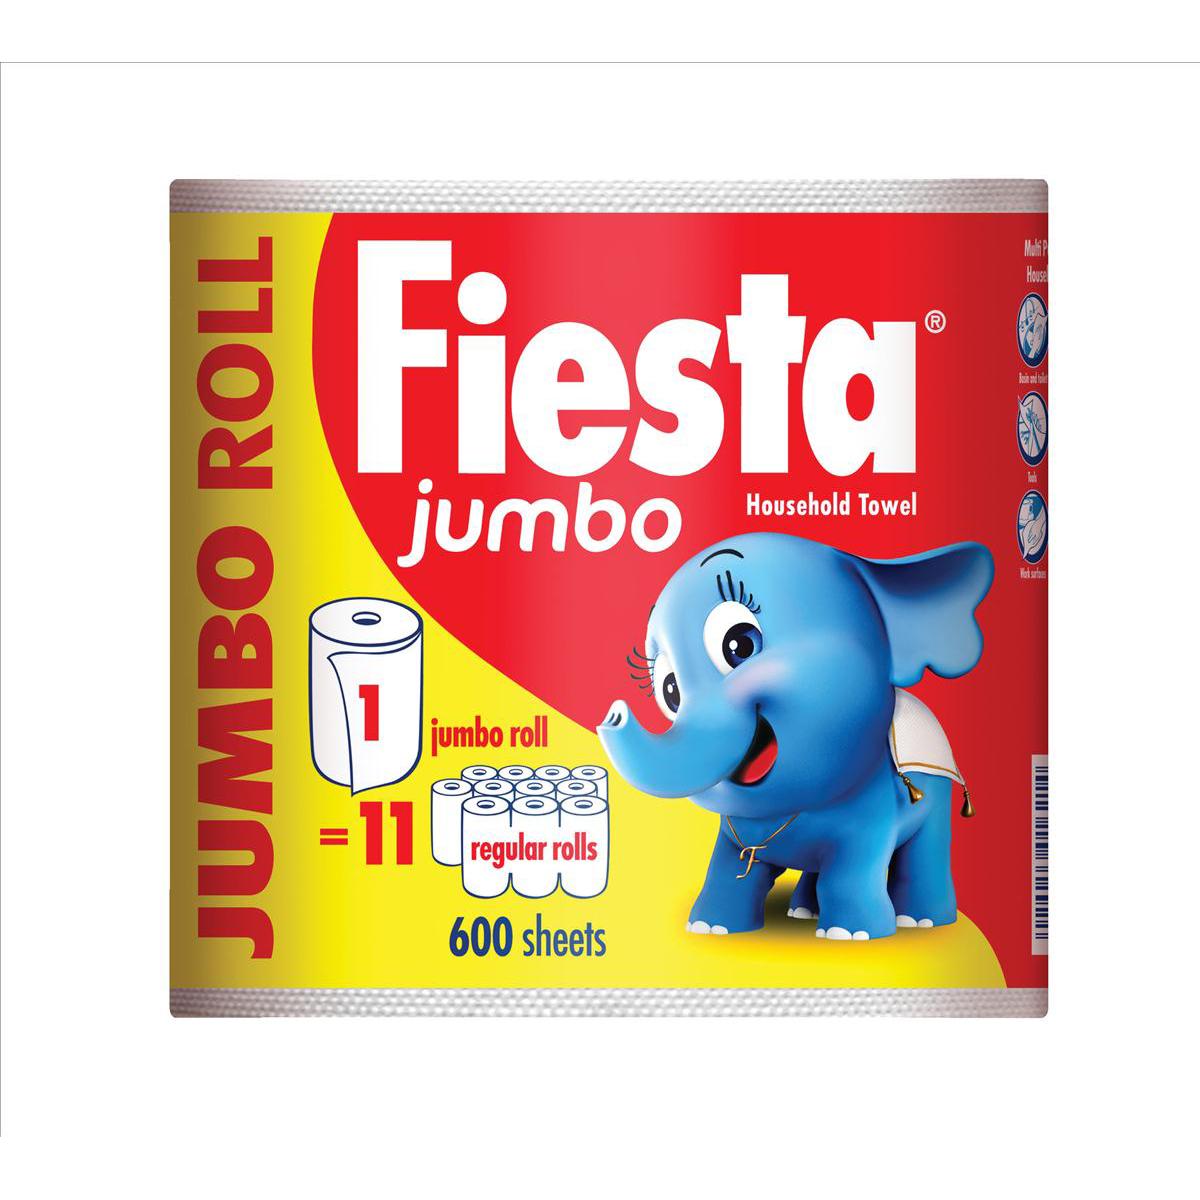 Fiesta Kitchen Towel Jumbo Roll 600 Sheets White Ref M01387